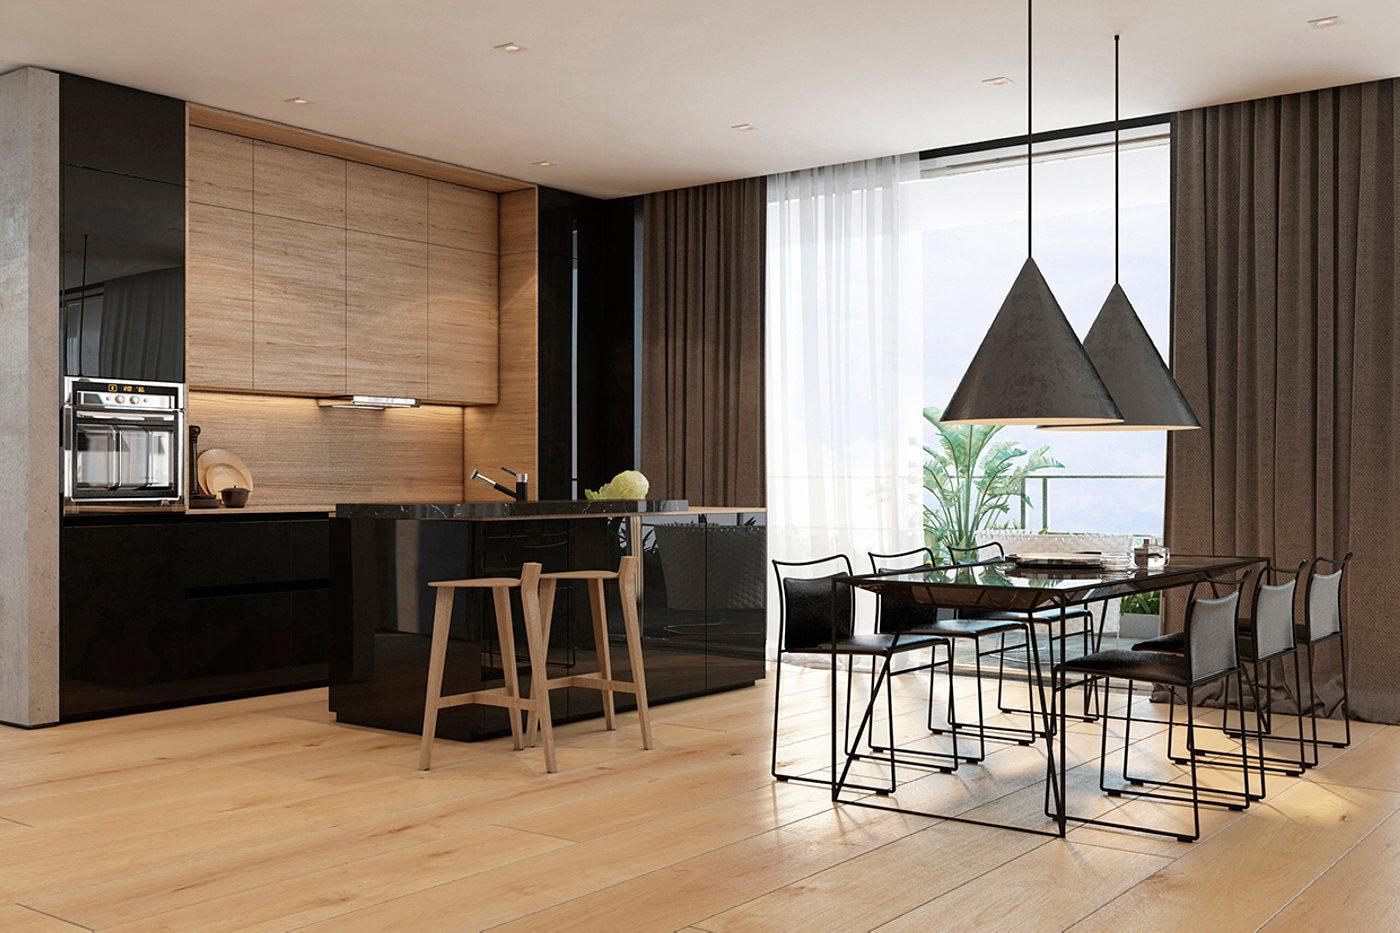 Gallery Of Cheap Apartments Tel Aviv Idea Interior Of Modern Apartments In Tel Aviv From Iryna Dzhemesiuk 4